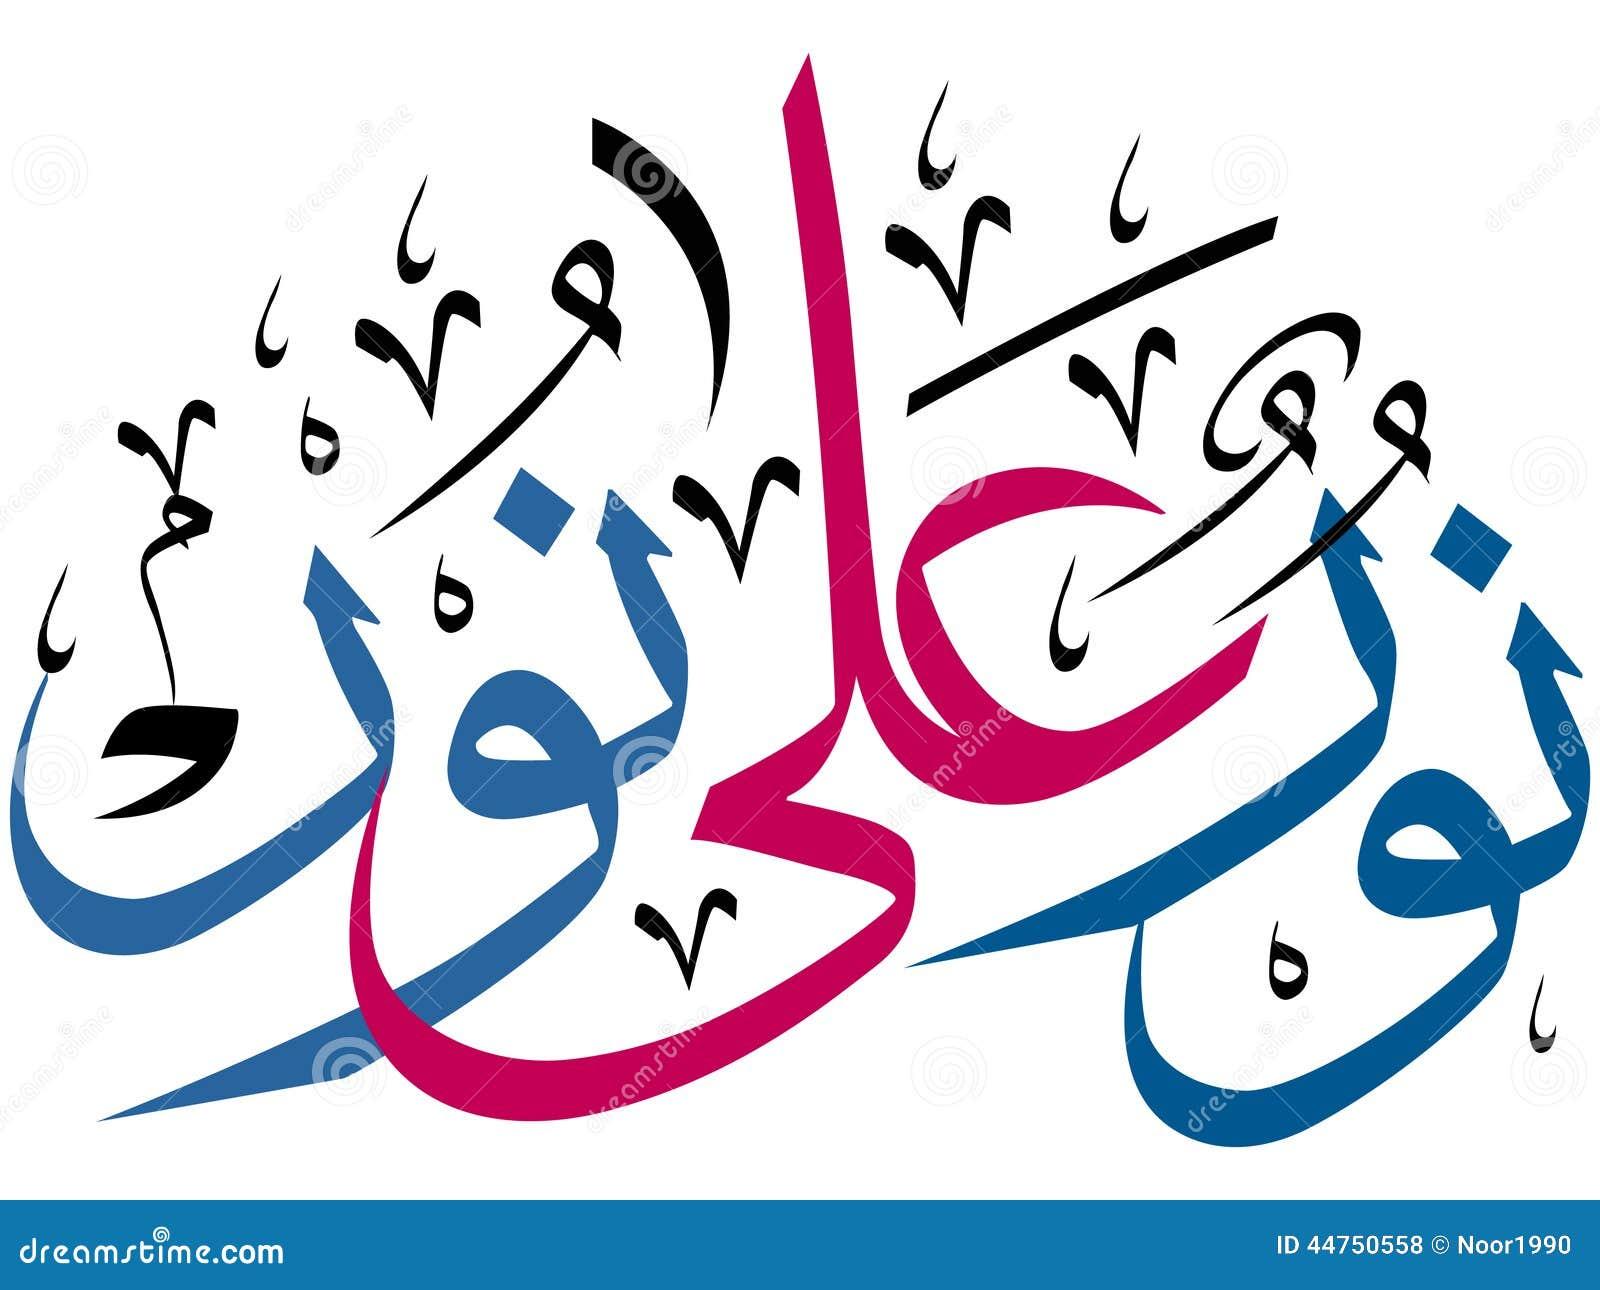 Quran Vector Calligraphy Joy Studio Design Gallery